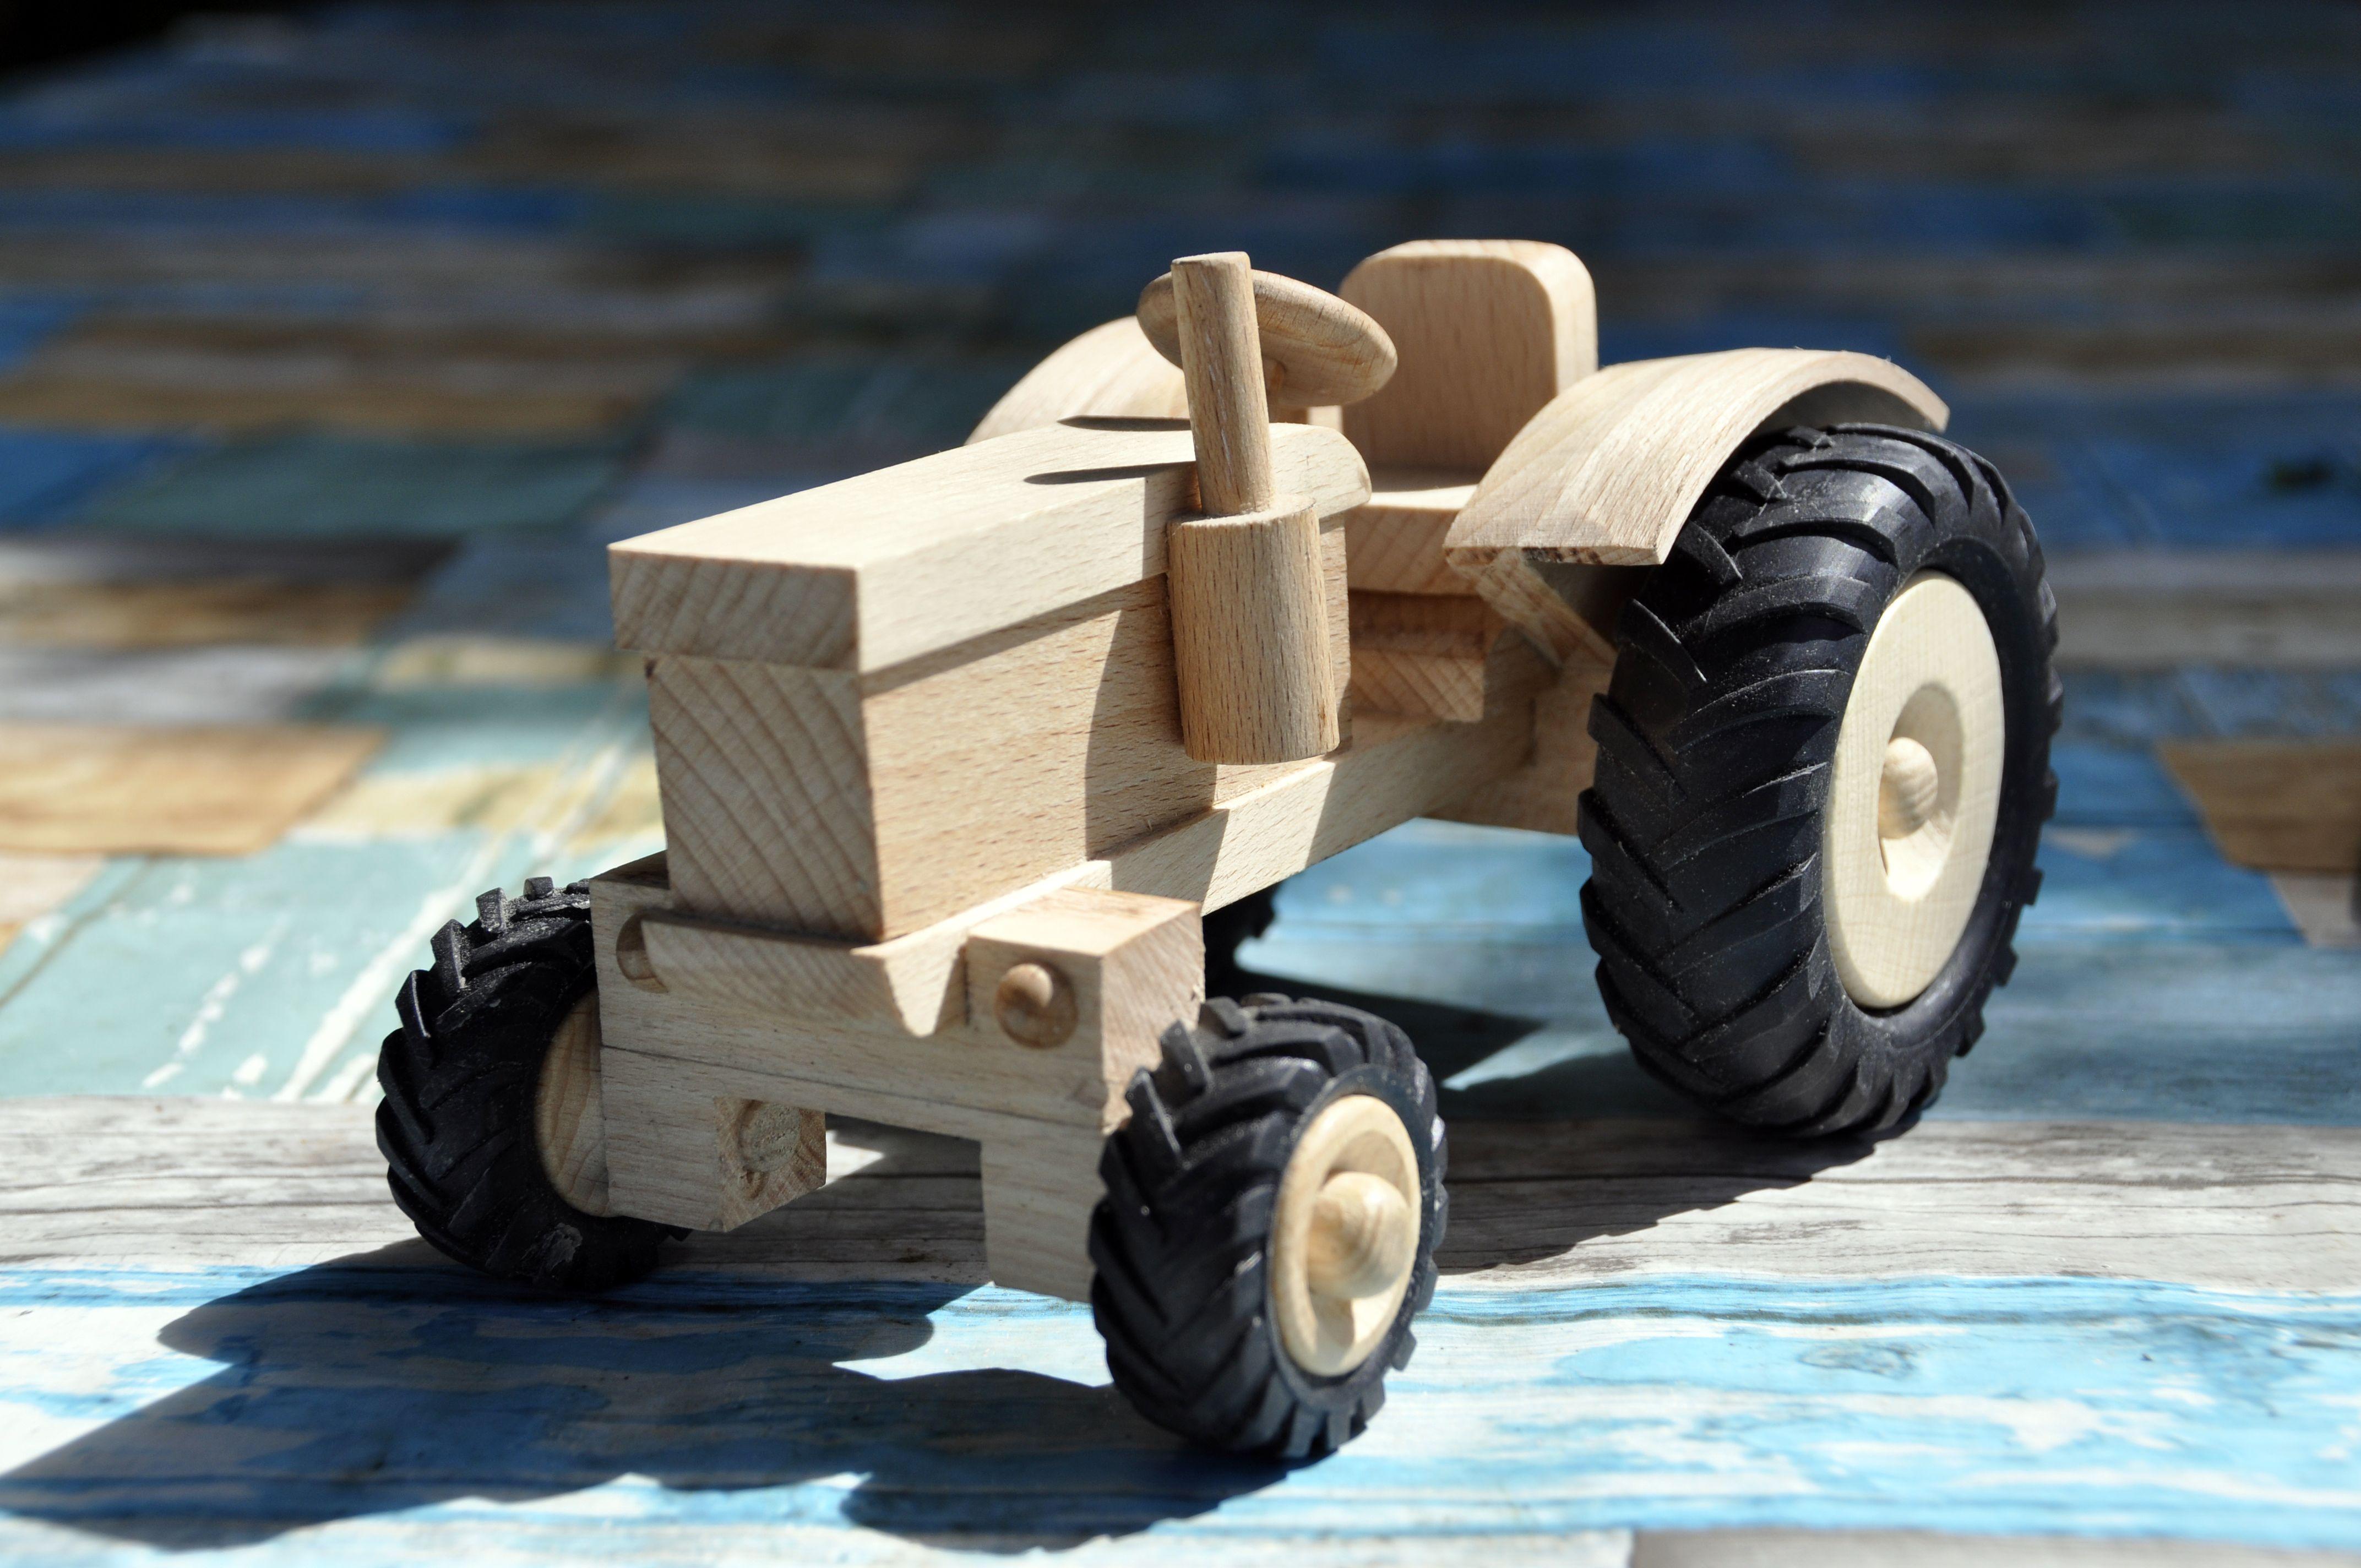 Quot Der Enkel Freut Sich Quot Nr 3 Traktor Bauanleitung